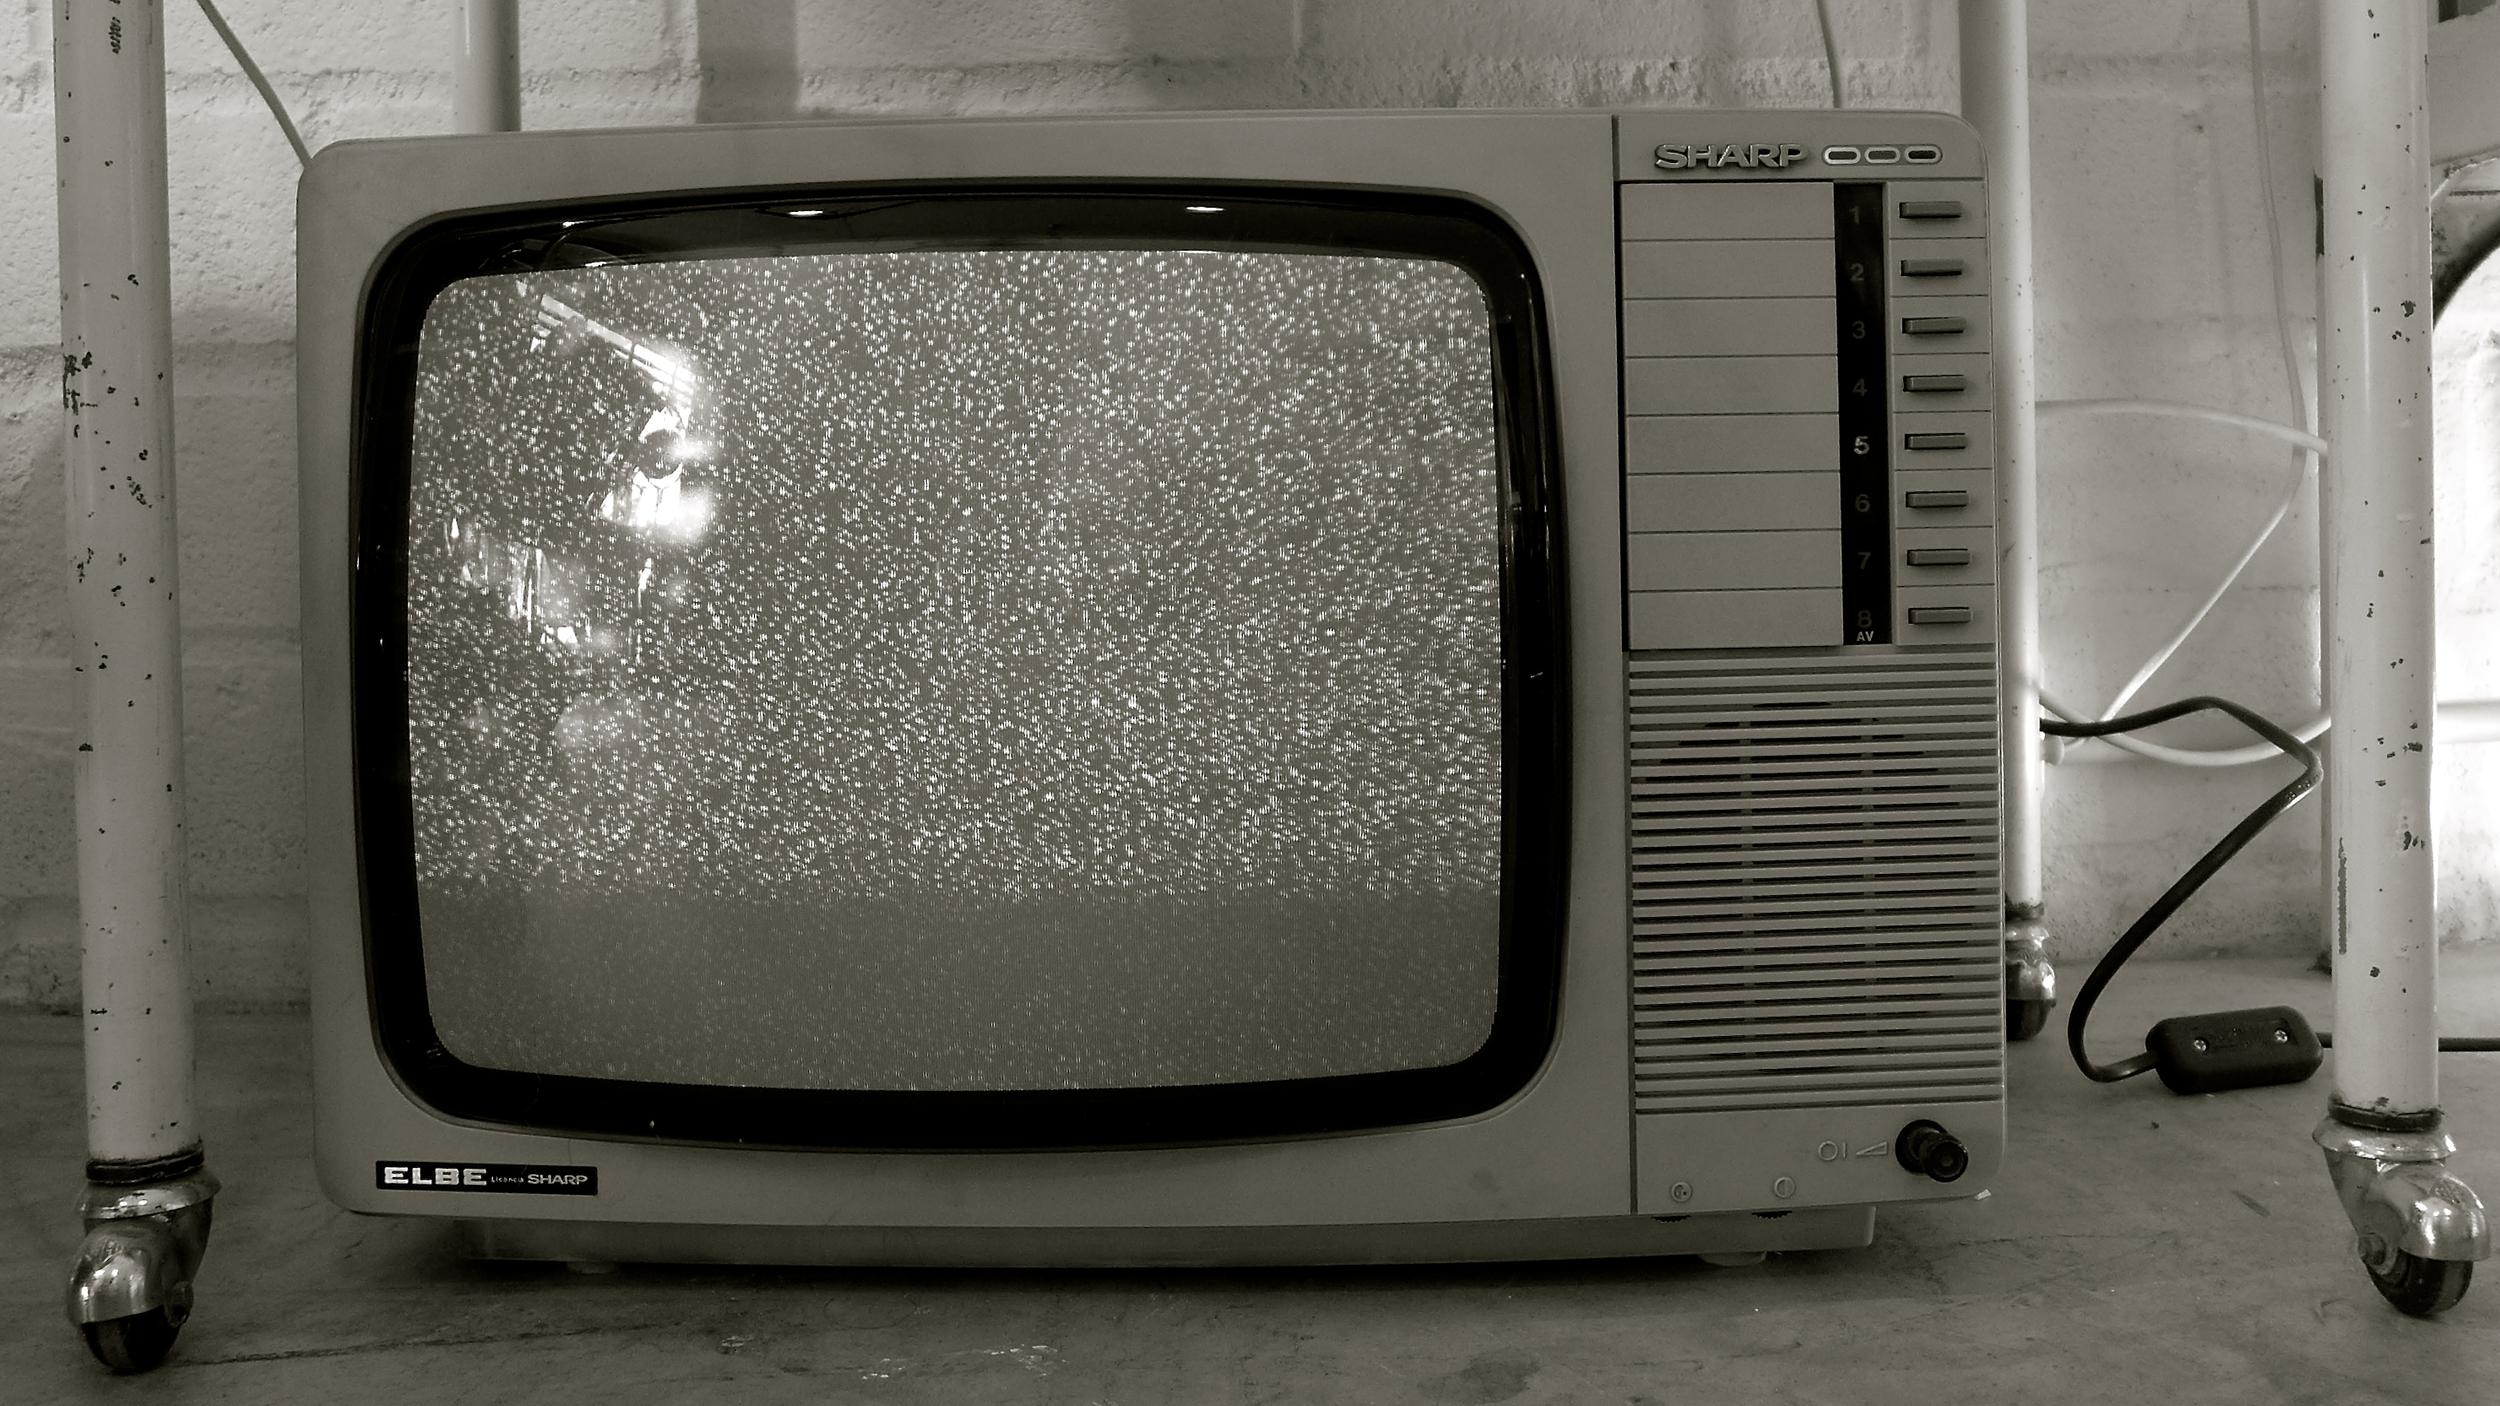 En blanco televisor